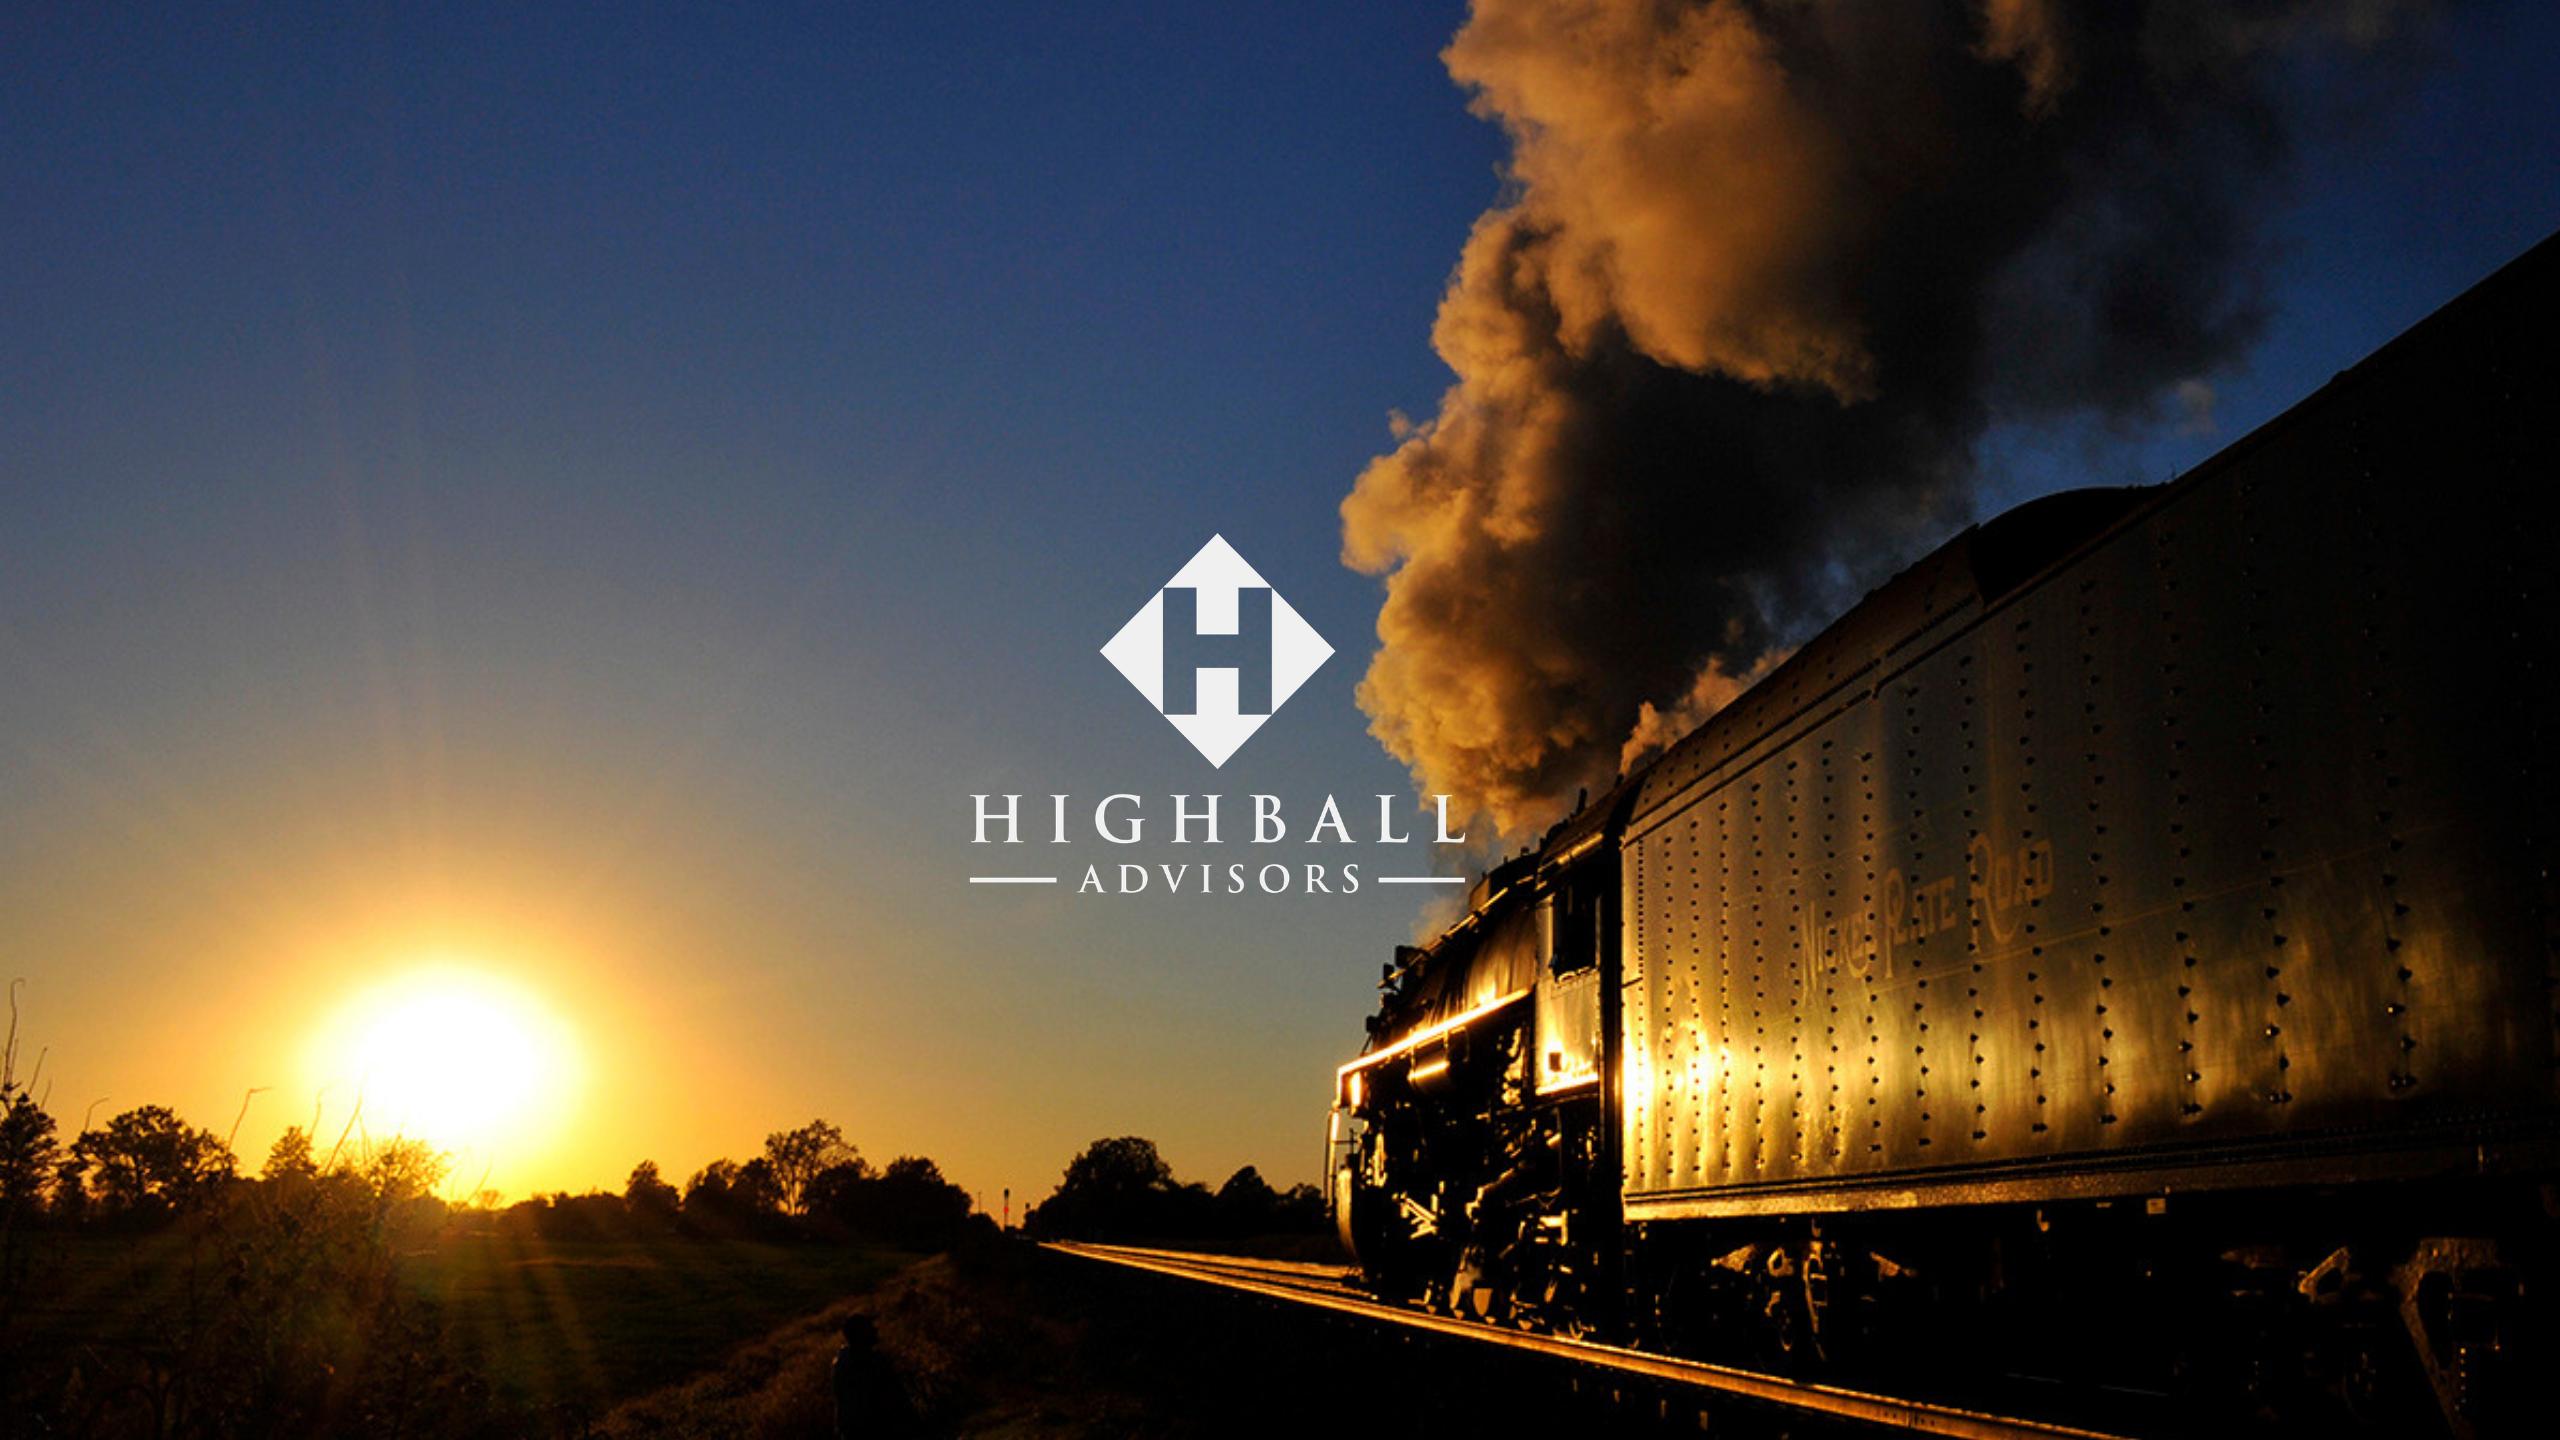 VIDEO: A Railroader's 401k Guide for Railroad Retirement Thumbnail